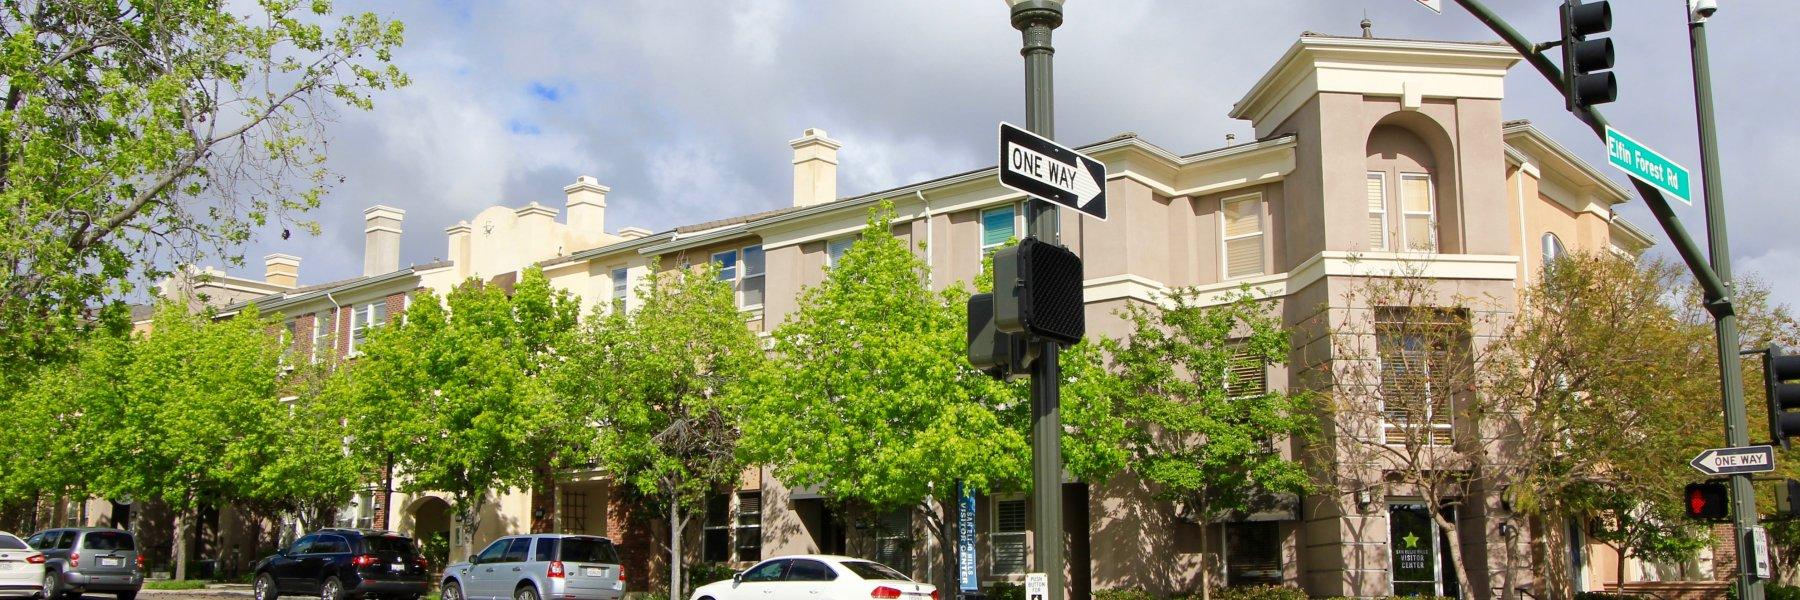 San Elijo Hills is a community of homes in San Marcos California